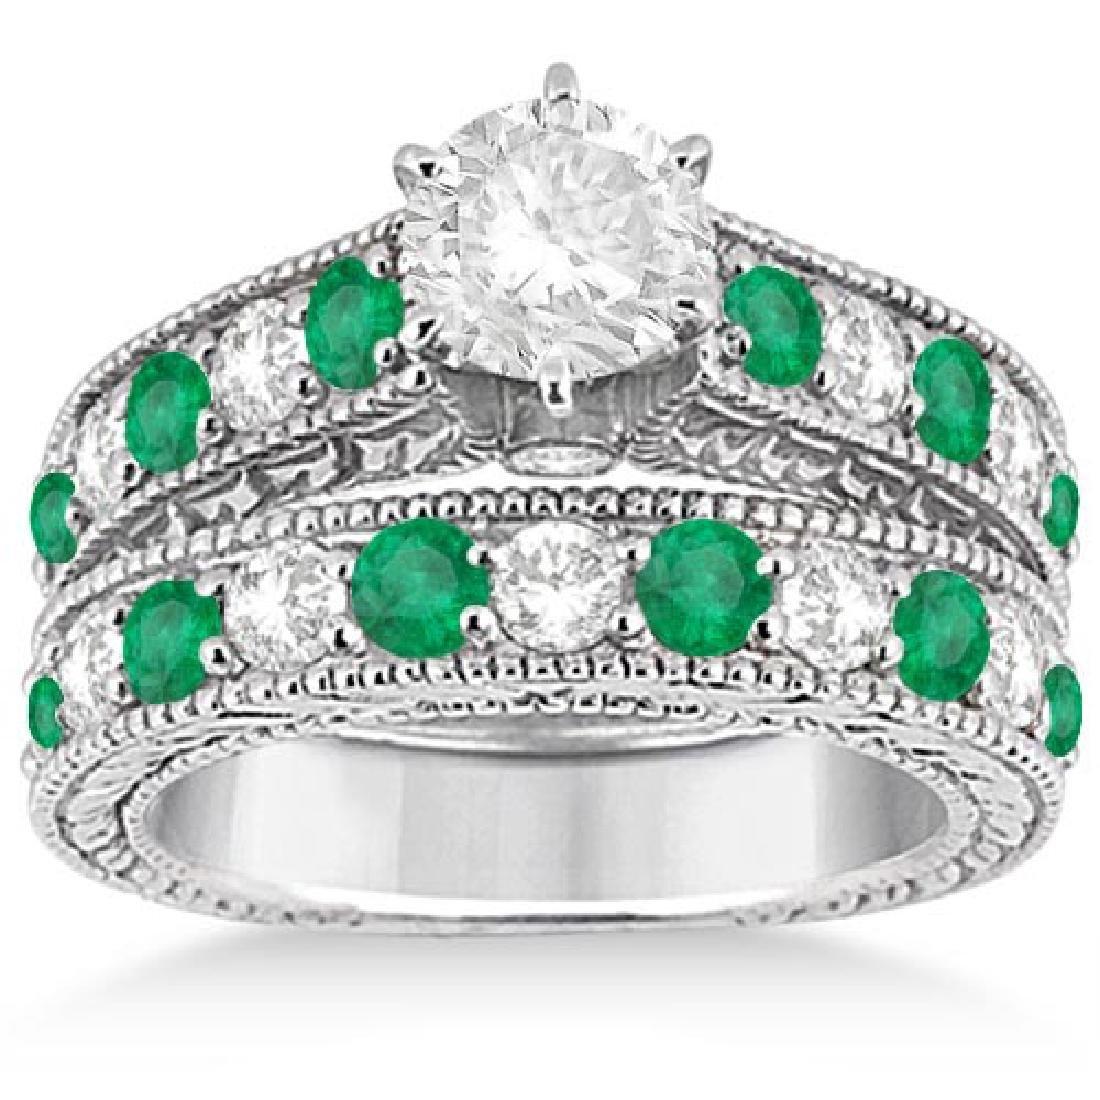 Antique Diamond and Emerald Bridal Ring Set 18k White G